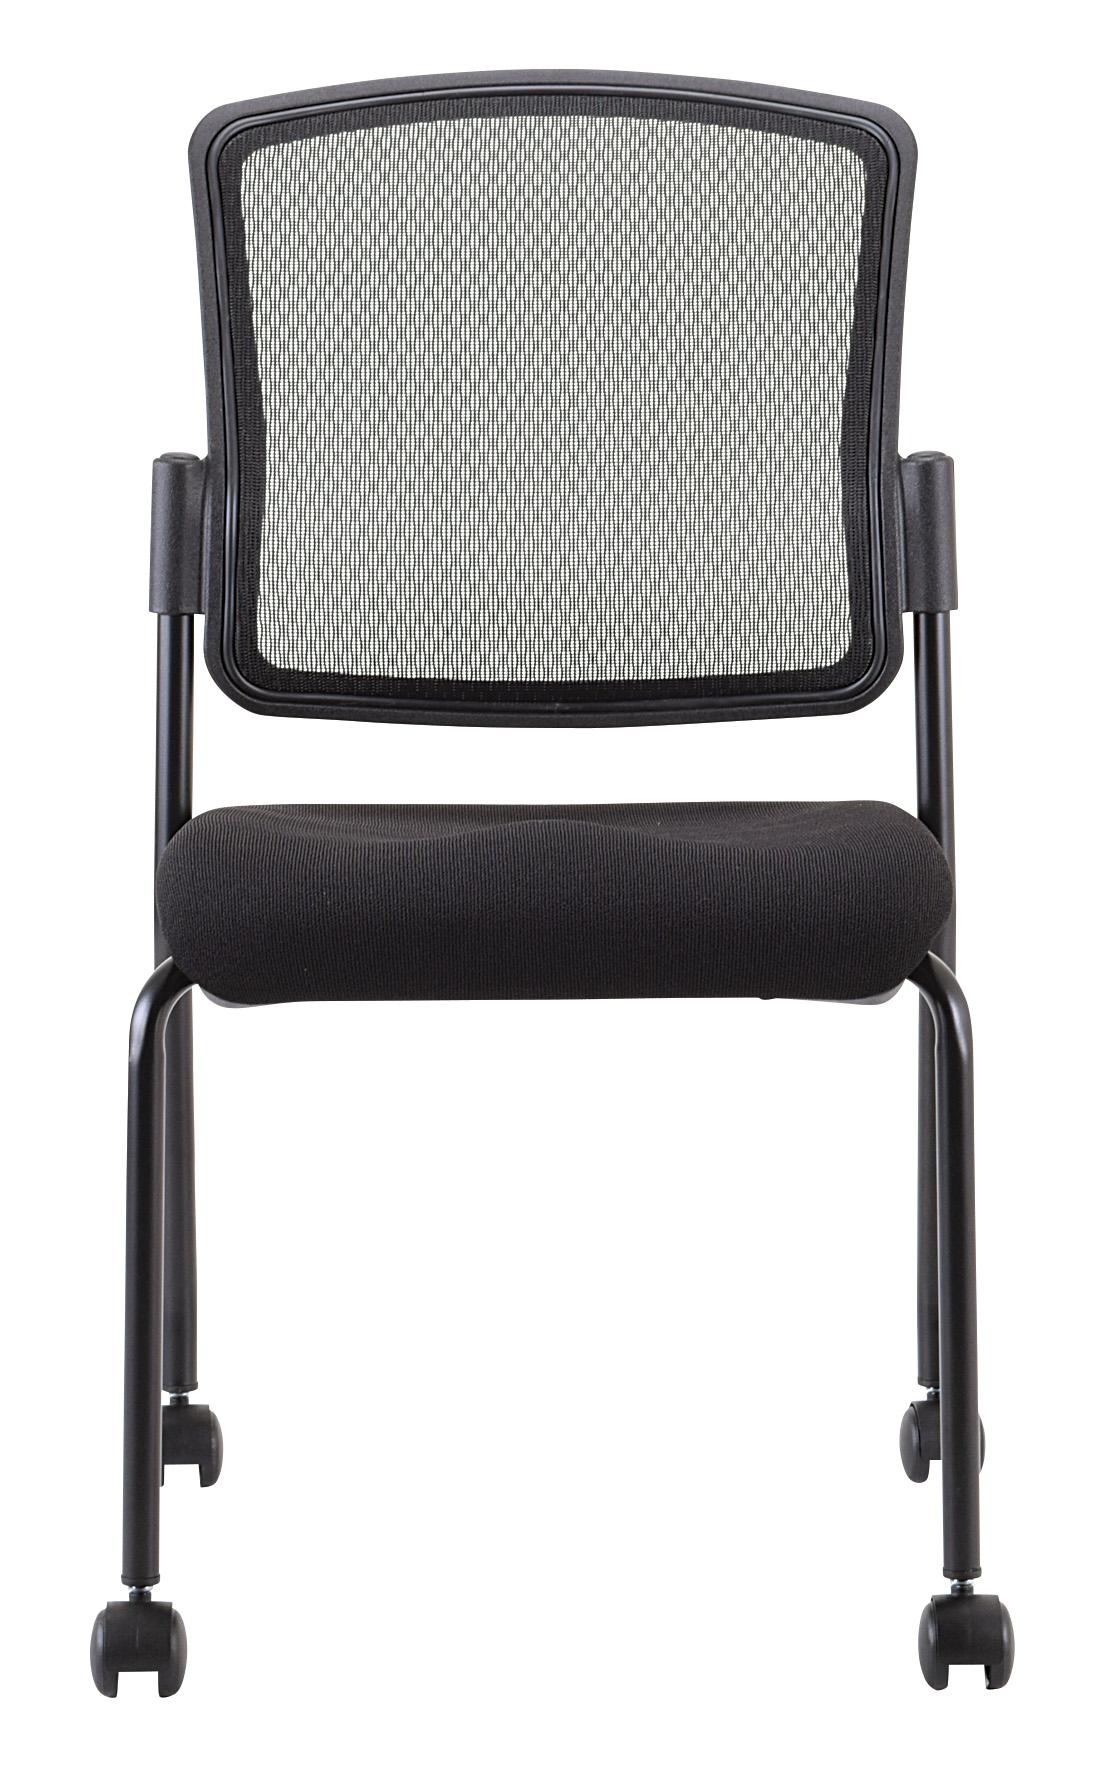 "19"" x 25"" x 35.5"" Black Mesh Fabric Guest Chair"